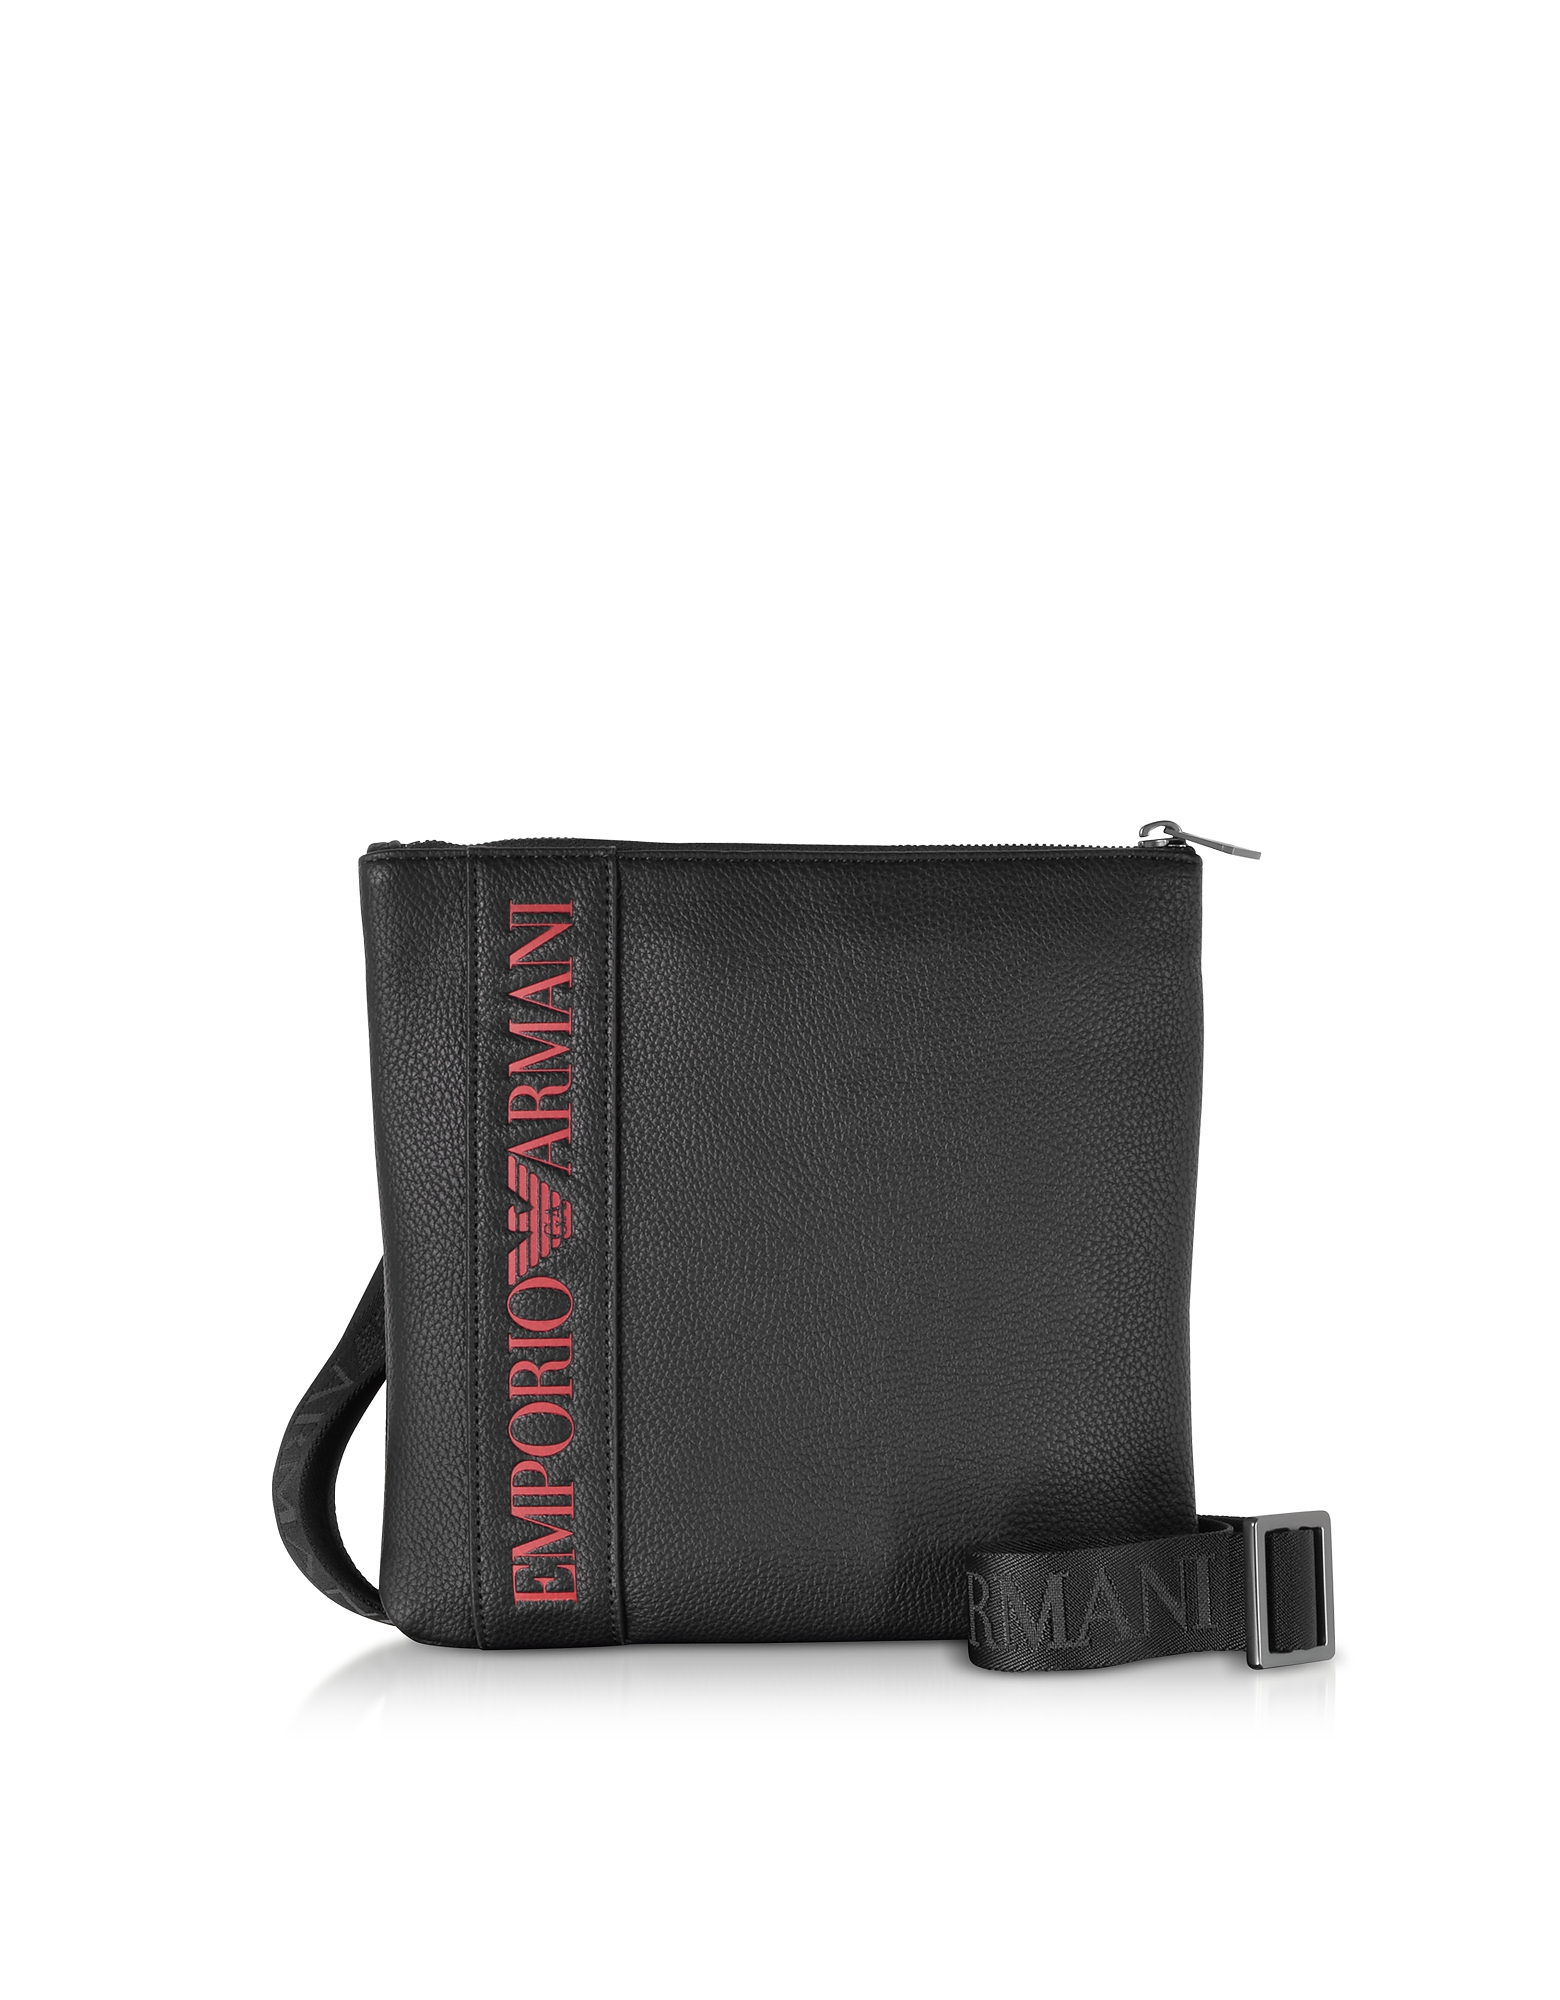 Signature Squared Men's Corssbody Bag